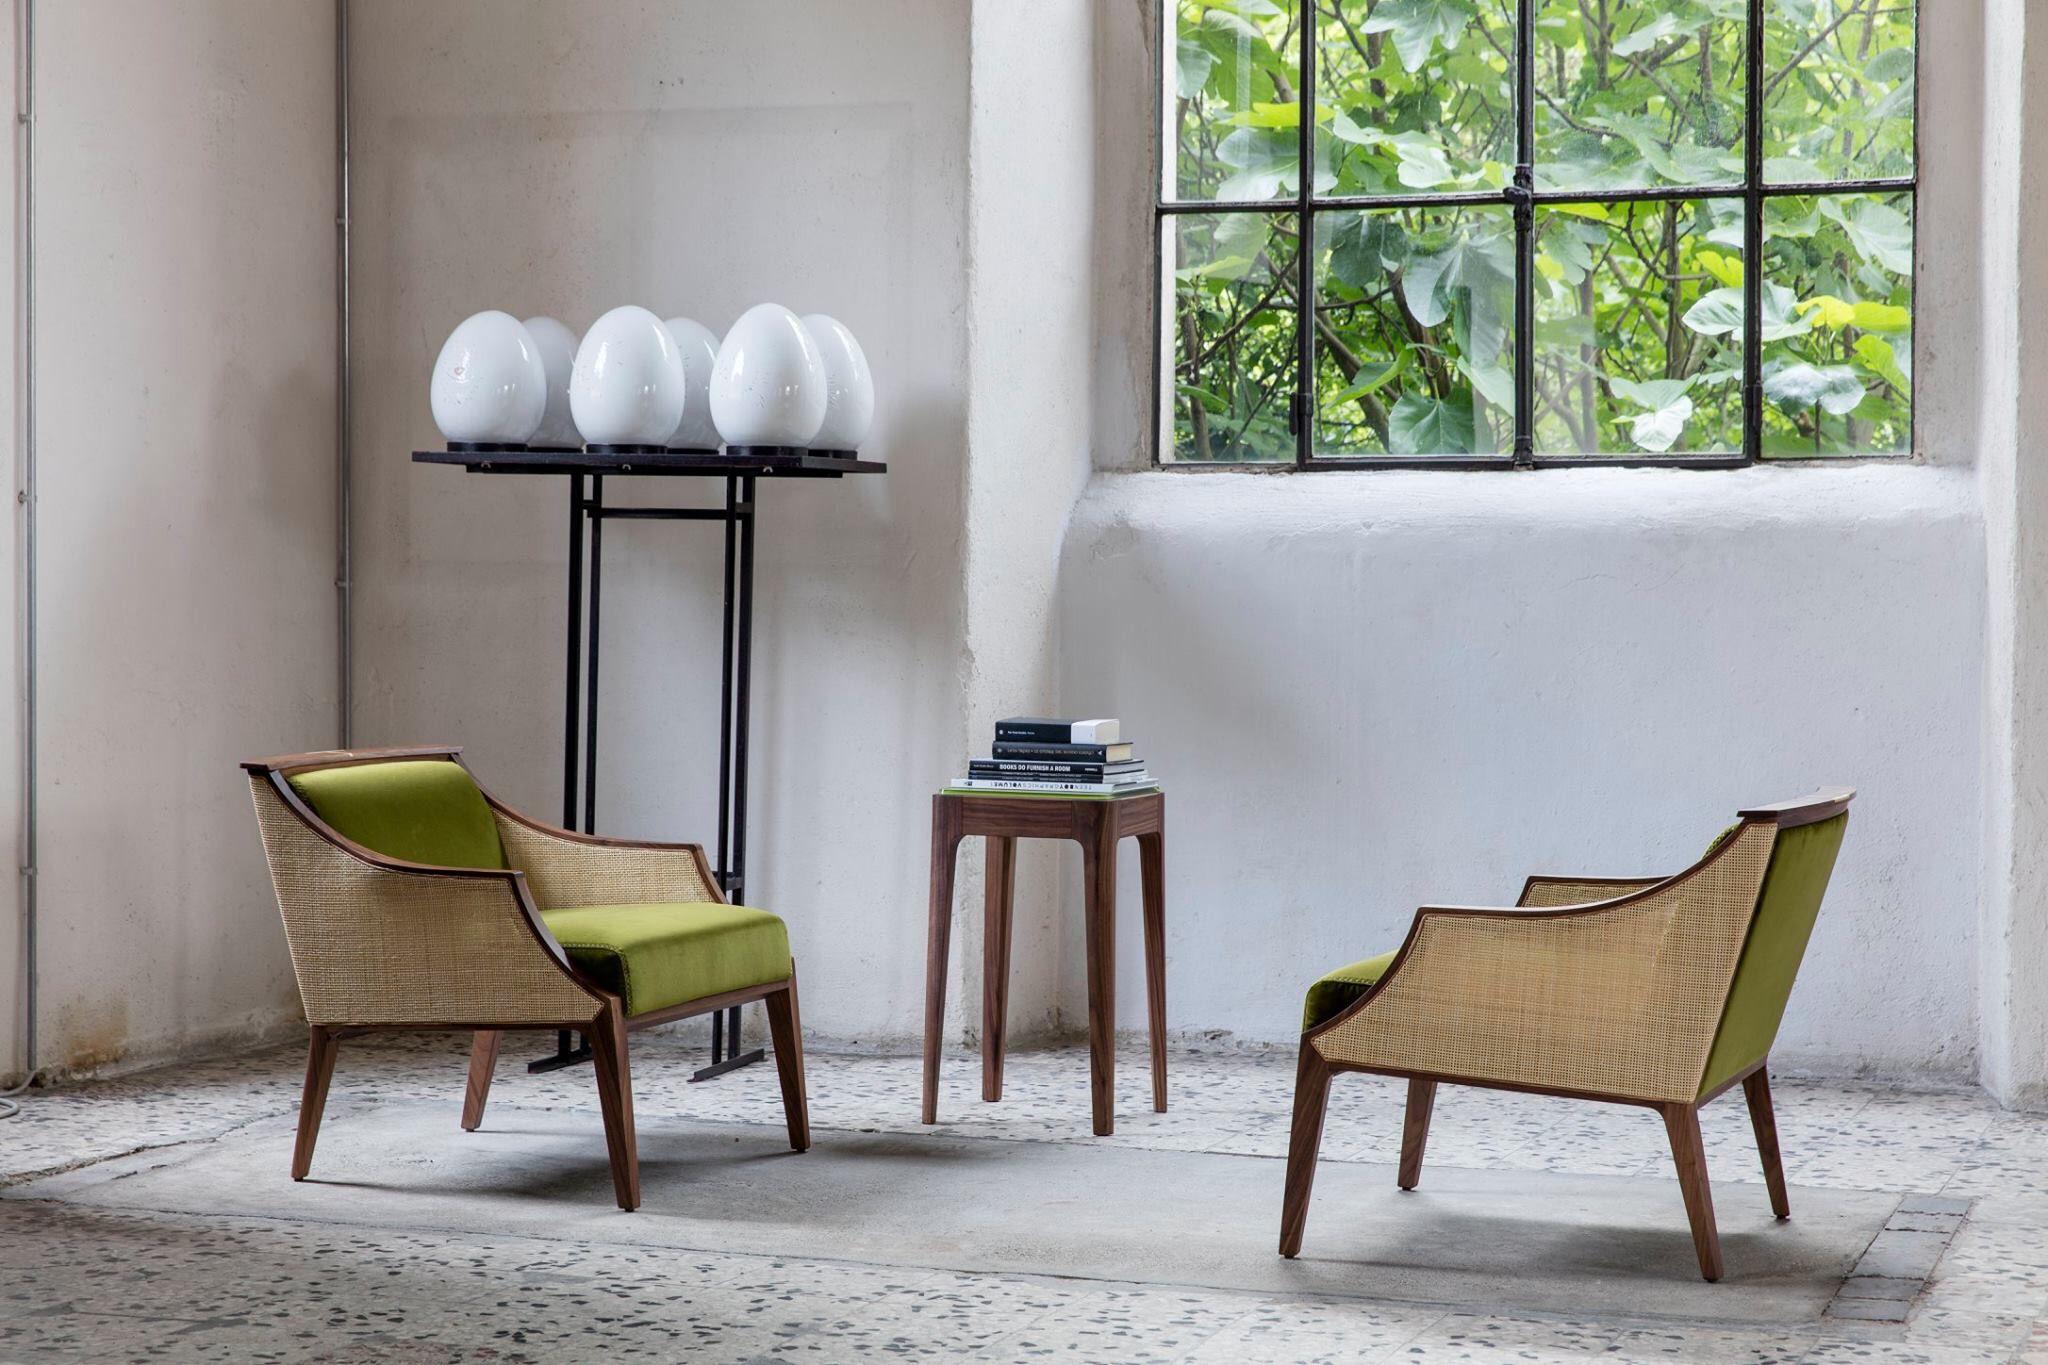 Porada mobili ~ My suite walk in closet and wendy armchairs by porada porada